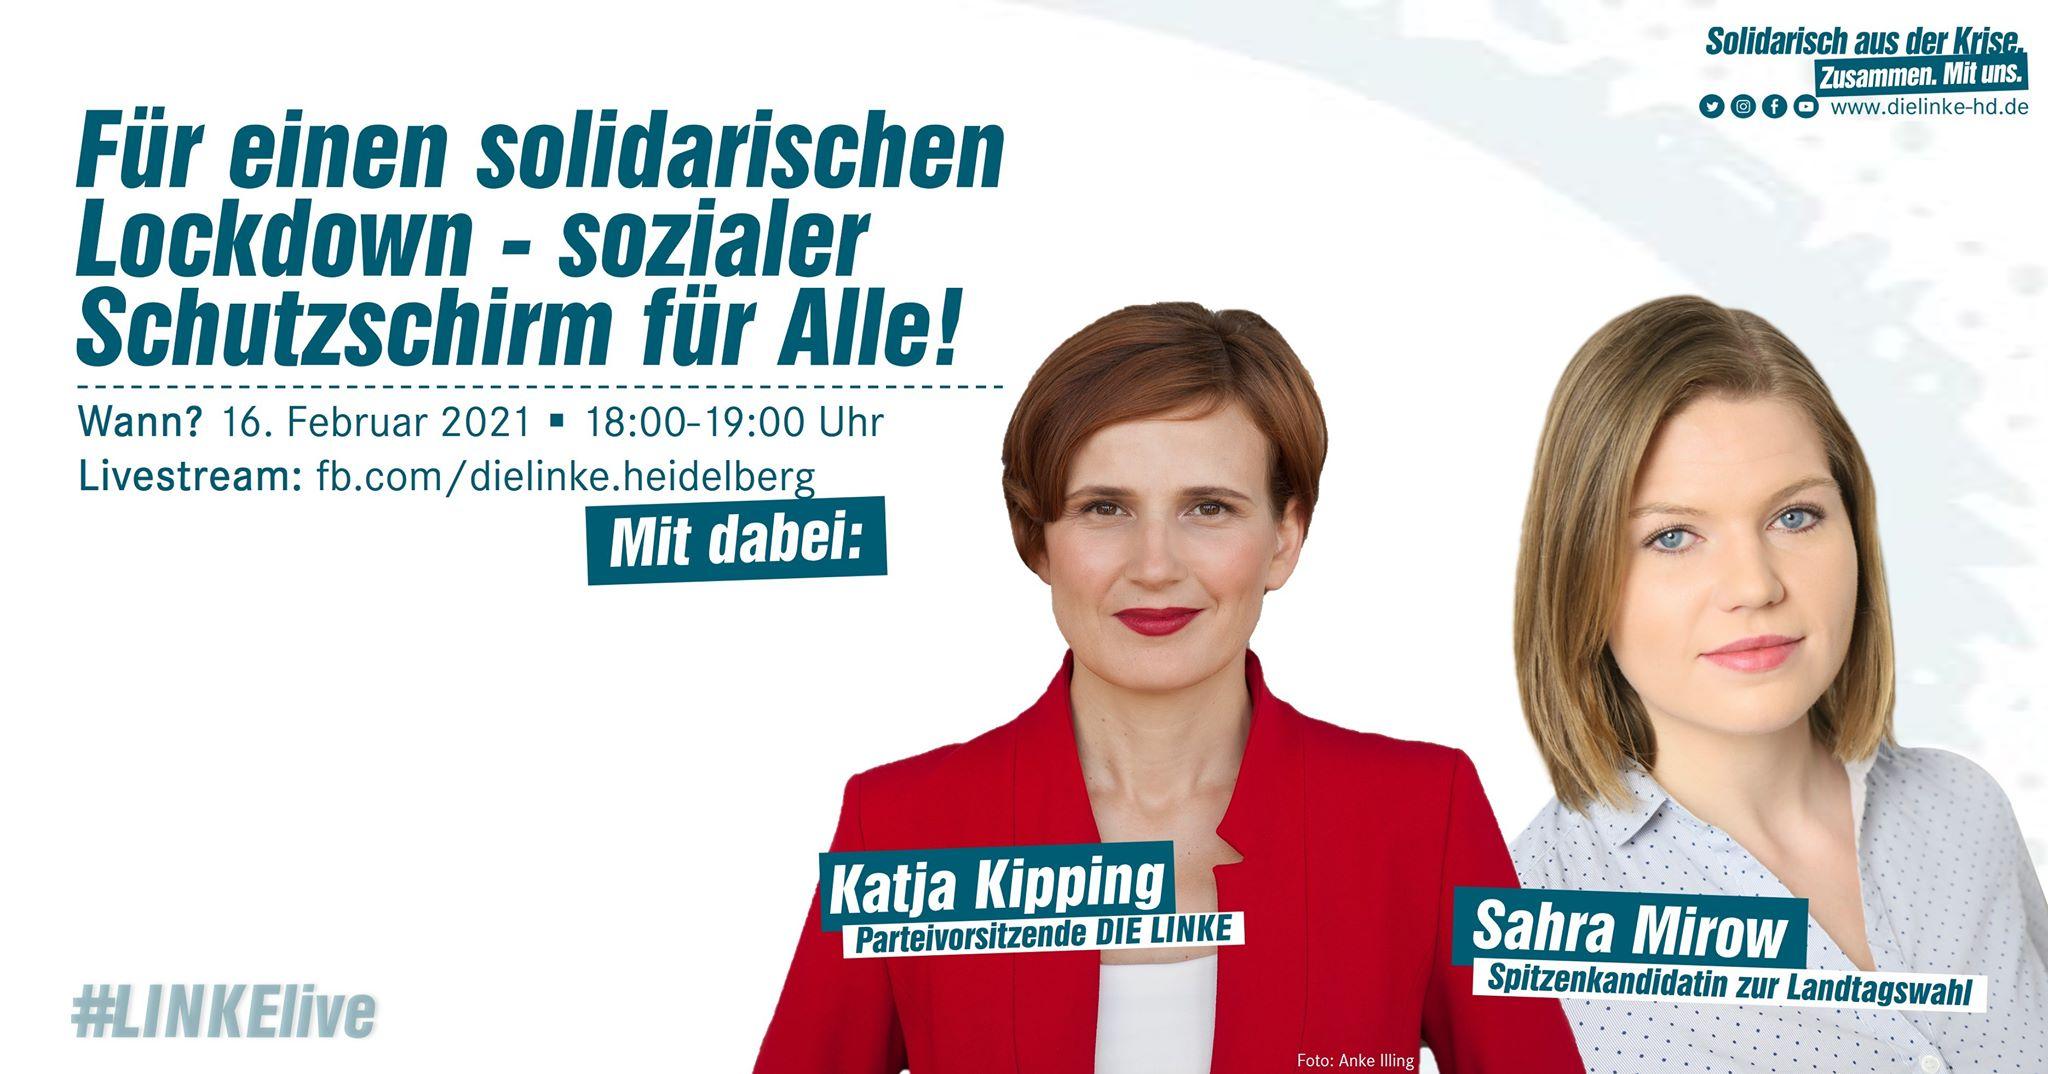 Veranstatlungfoto mit Katja Kipping und Sahra Mirow